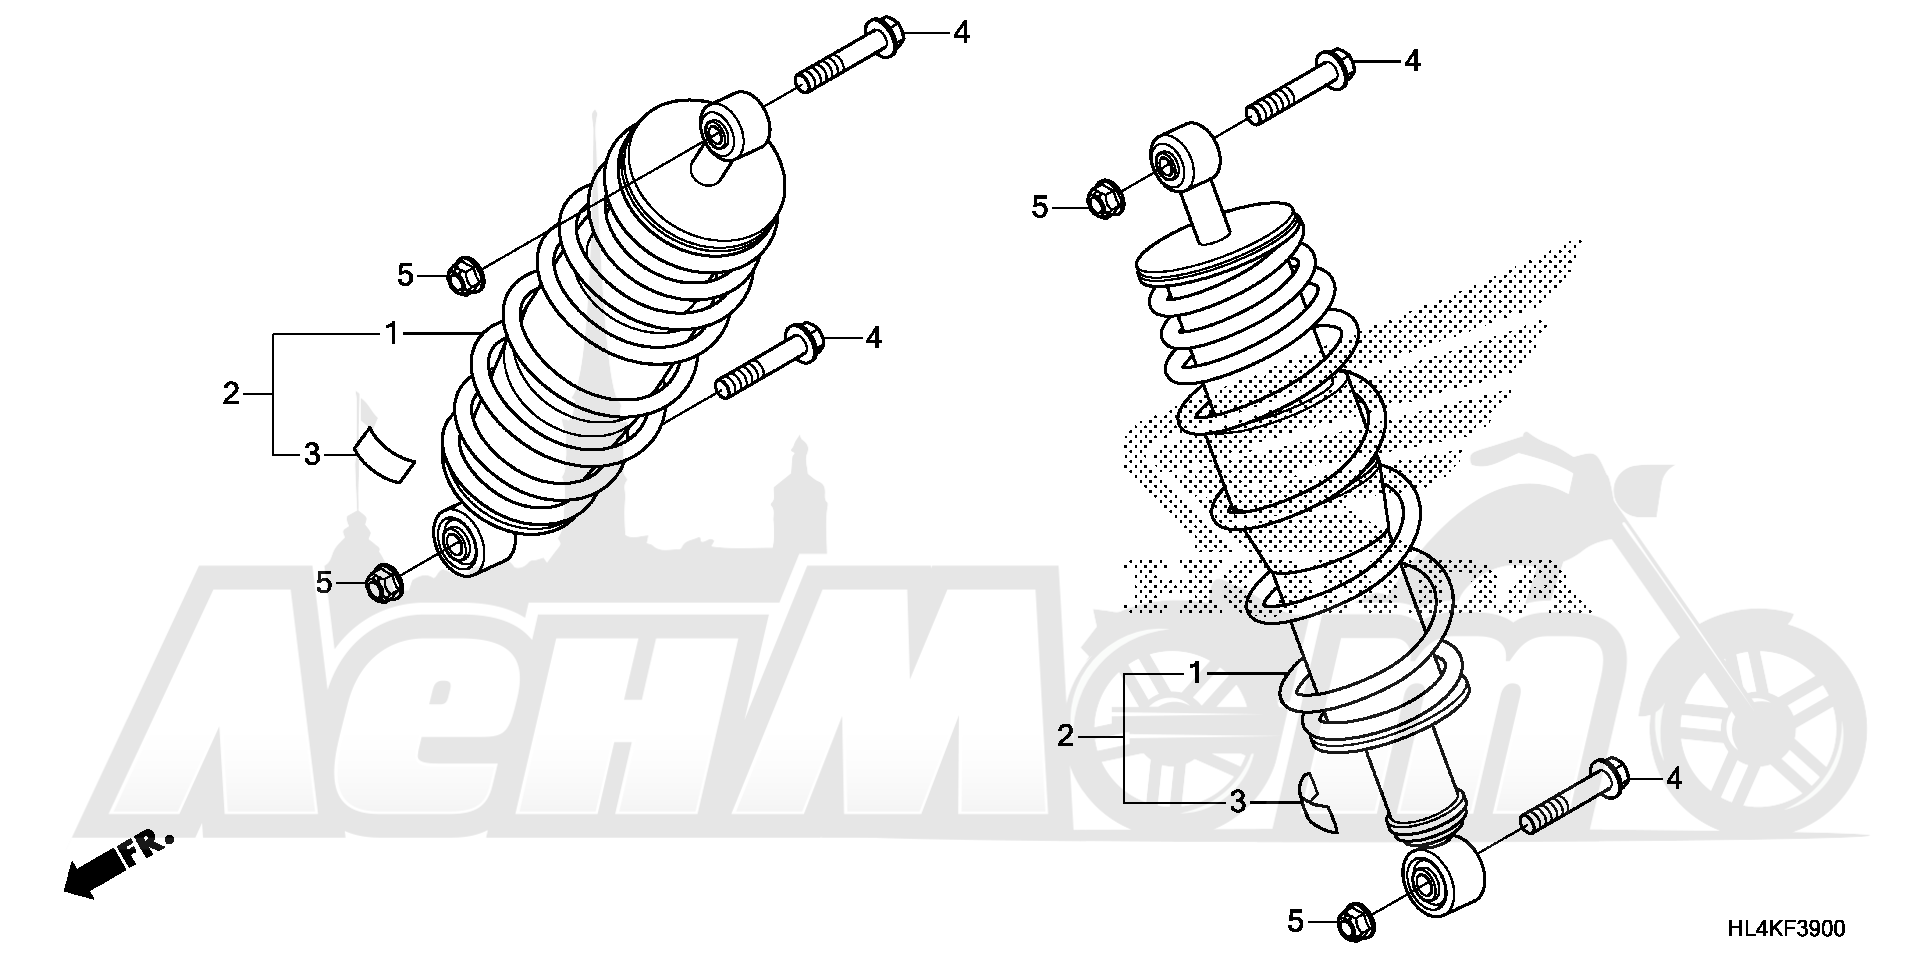 Запчасти для Квадроцикла Honda 2019 SXS1000M3P Раздел: REAR SHOCK ABSORBER (1) | зад амортизатор (1)